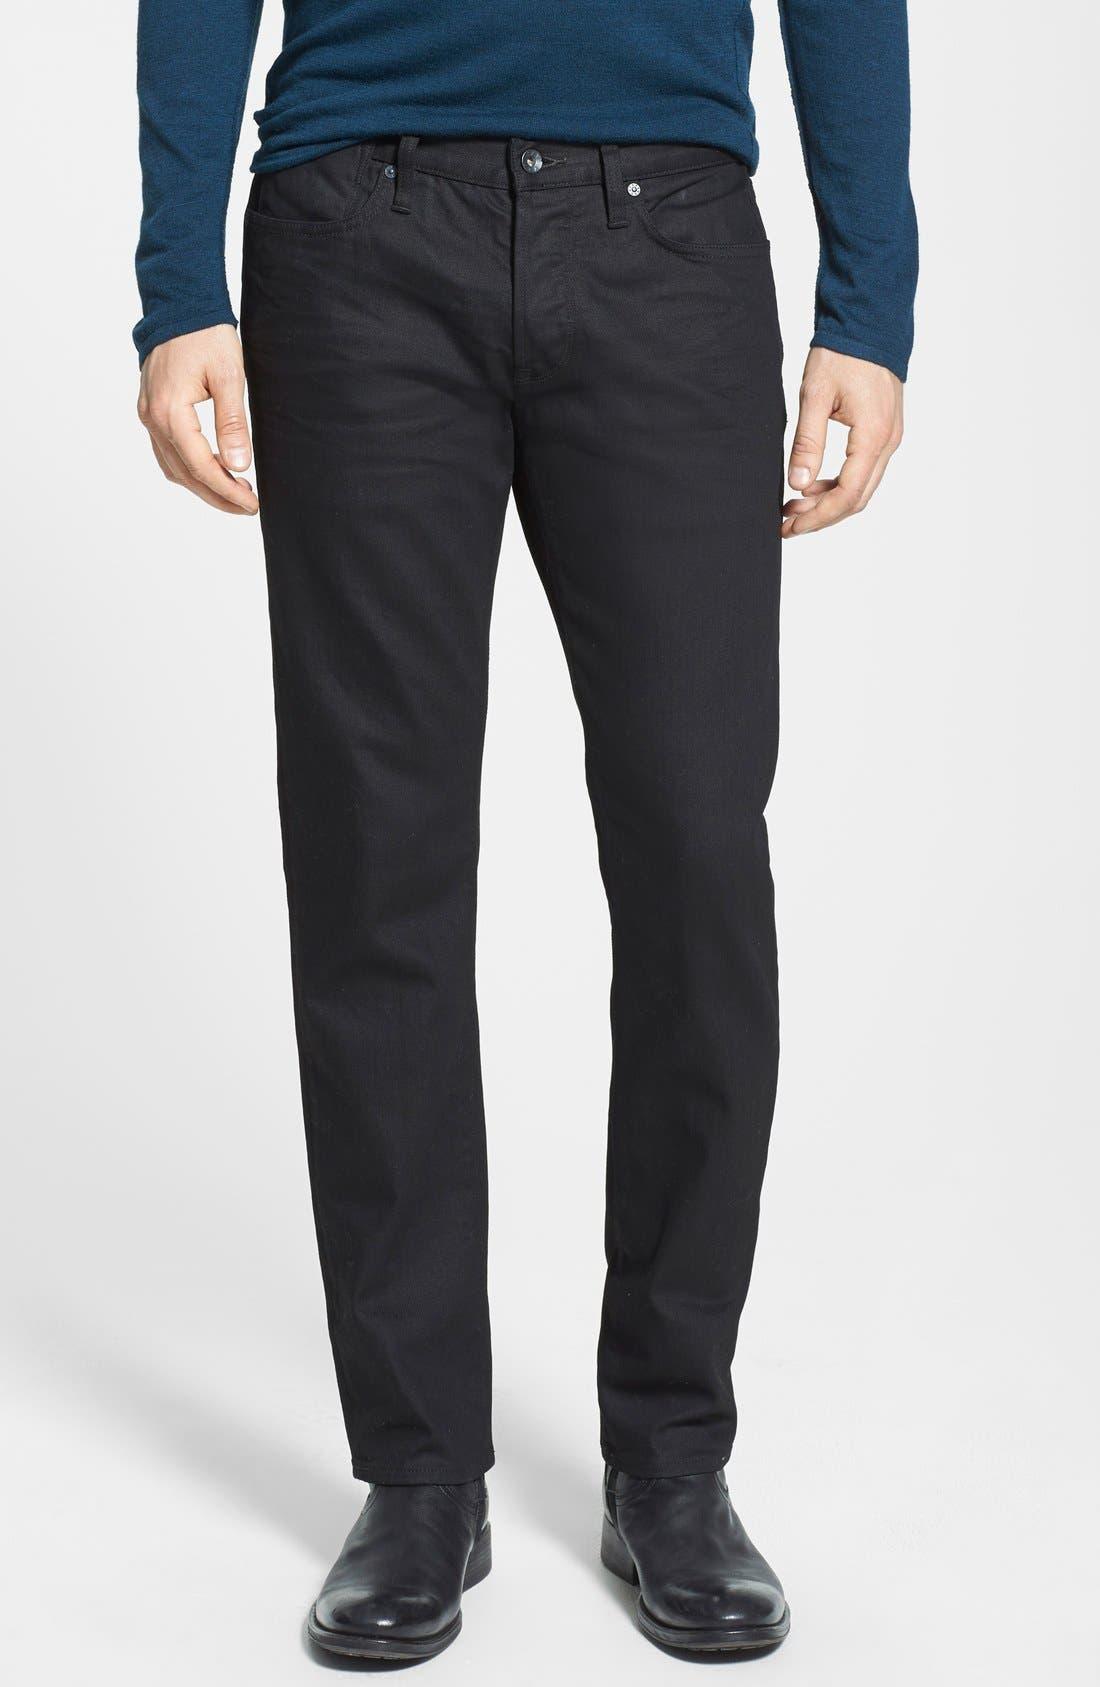 Alternate Image 1 Selected - John Varvatos Star USA 'Bowery' Slim Straight Leg Jeans (Jet Black)